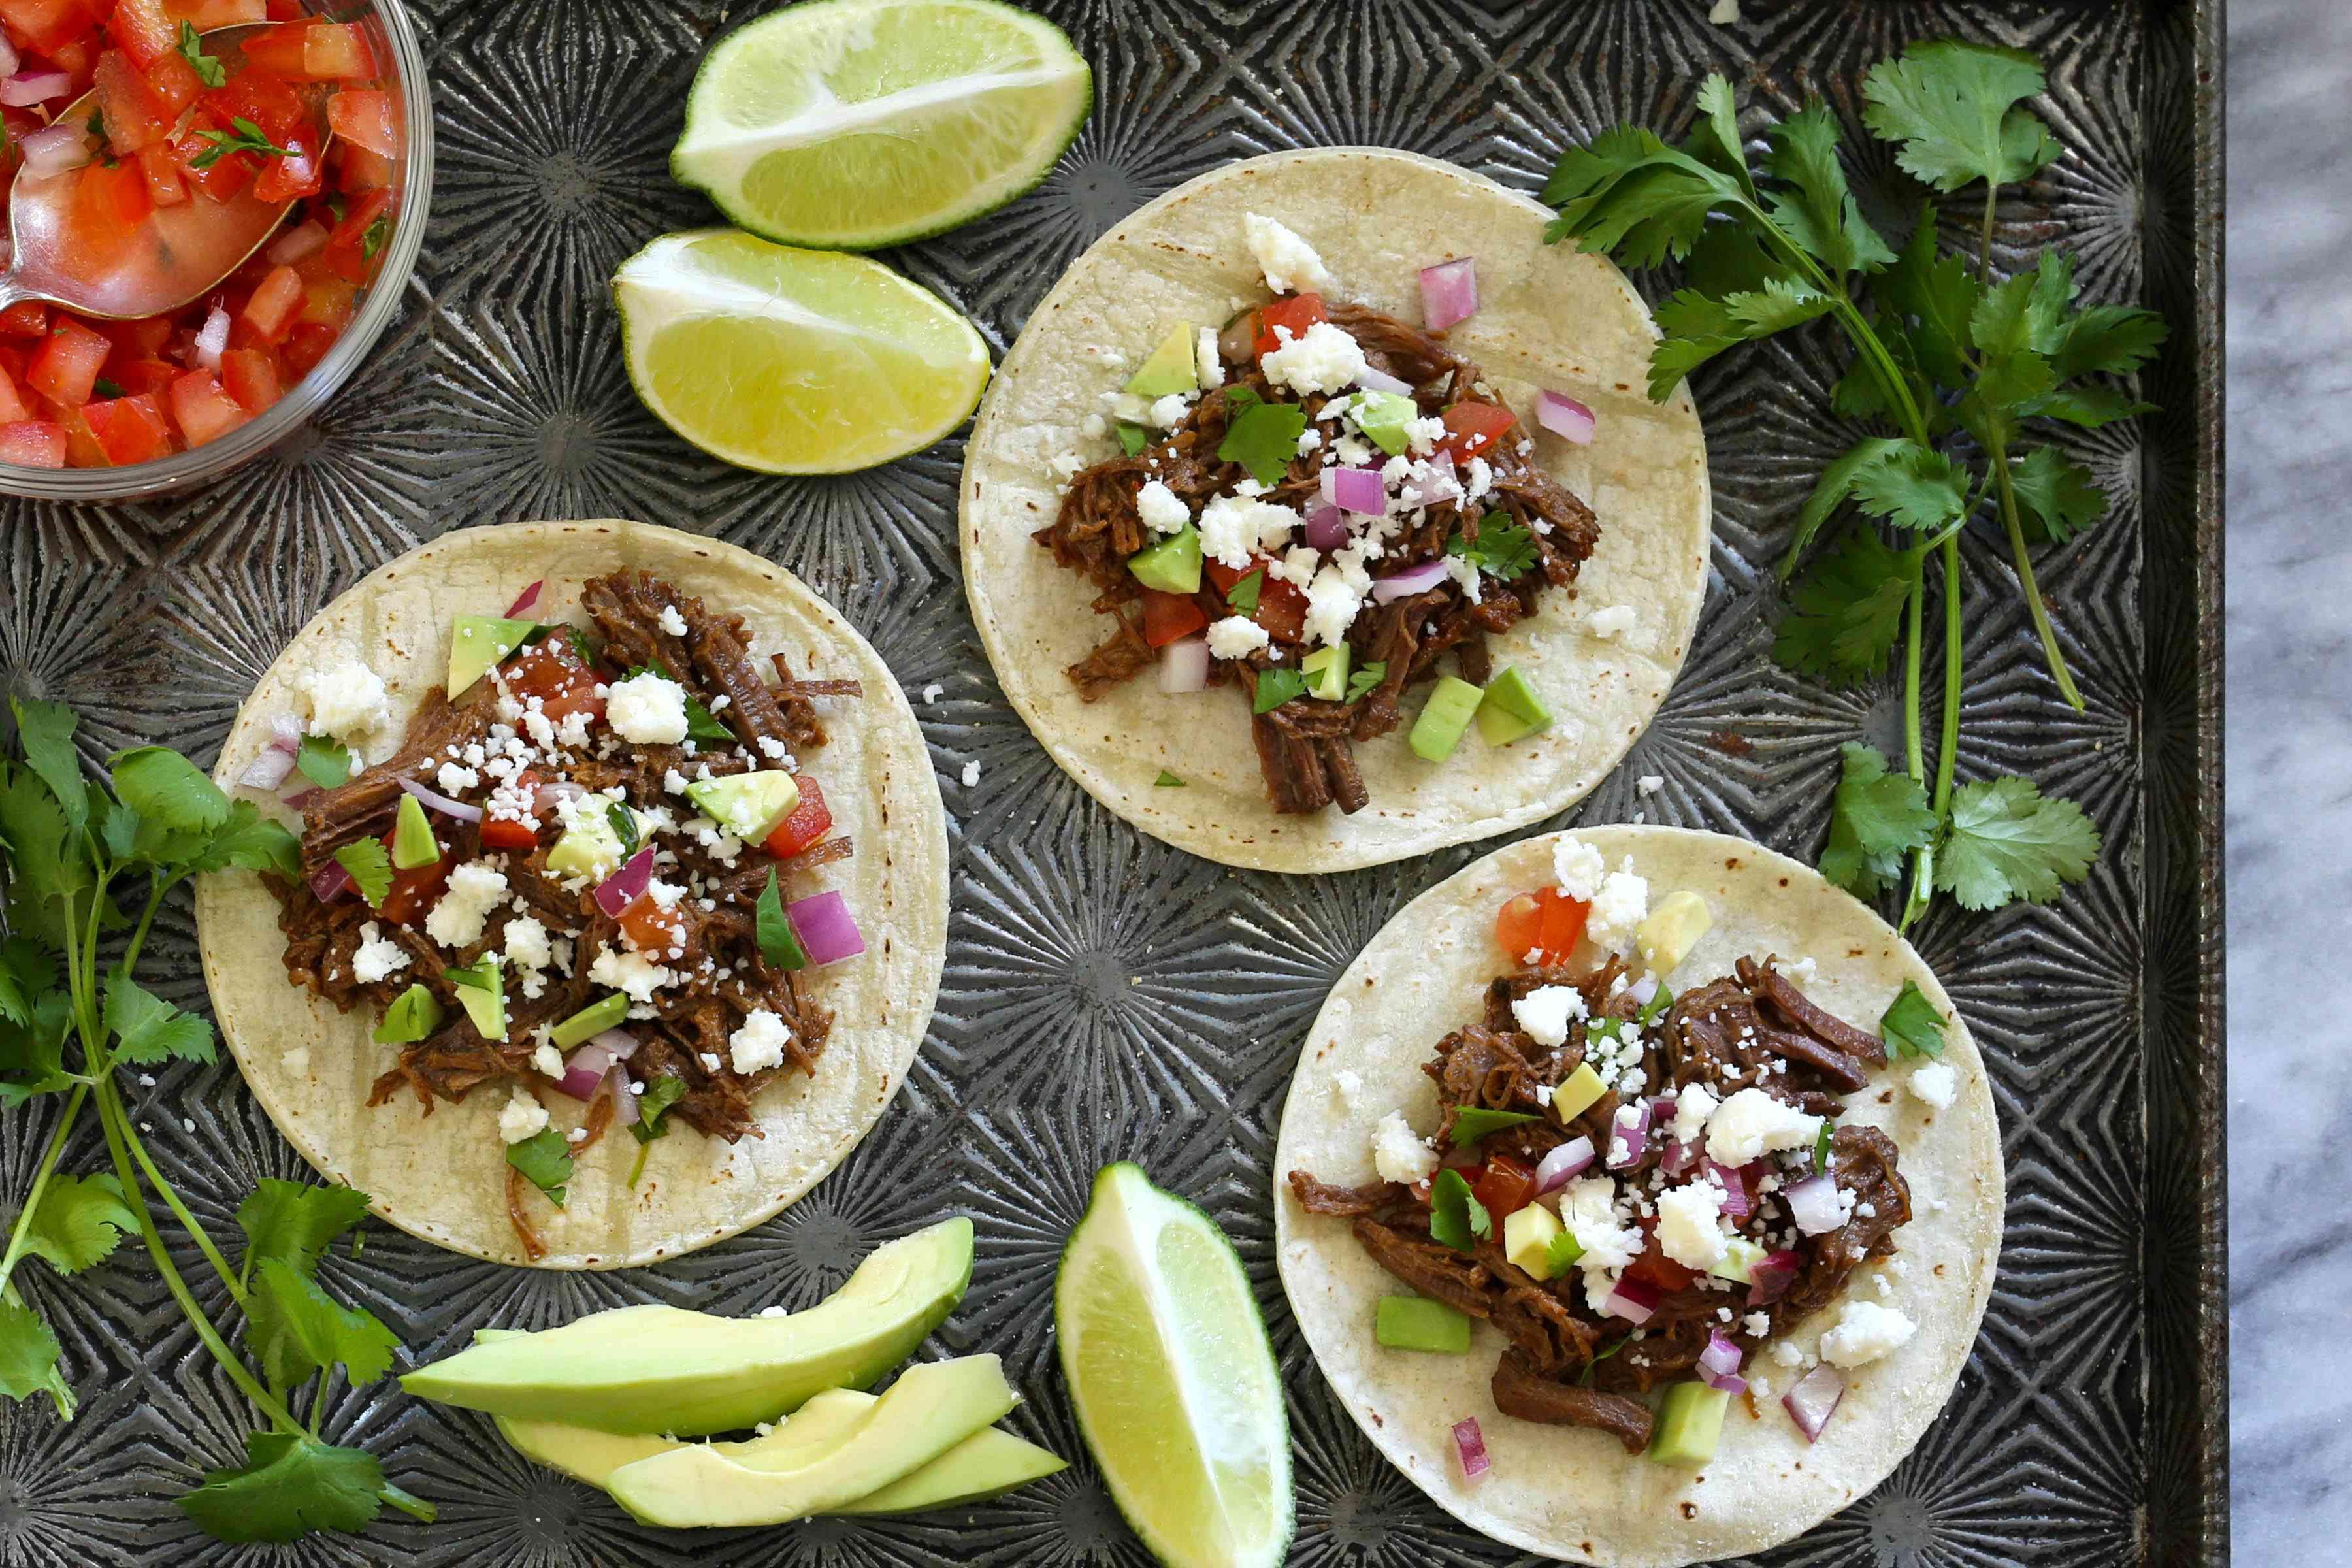 Barbacoa tacos with fixings.